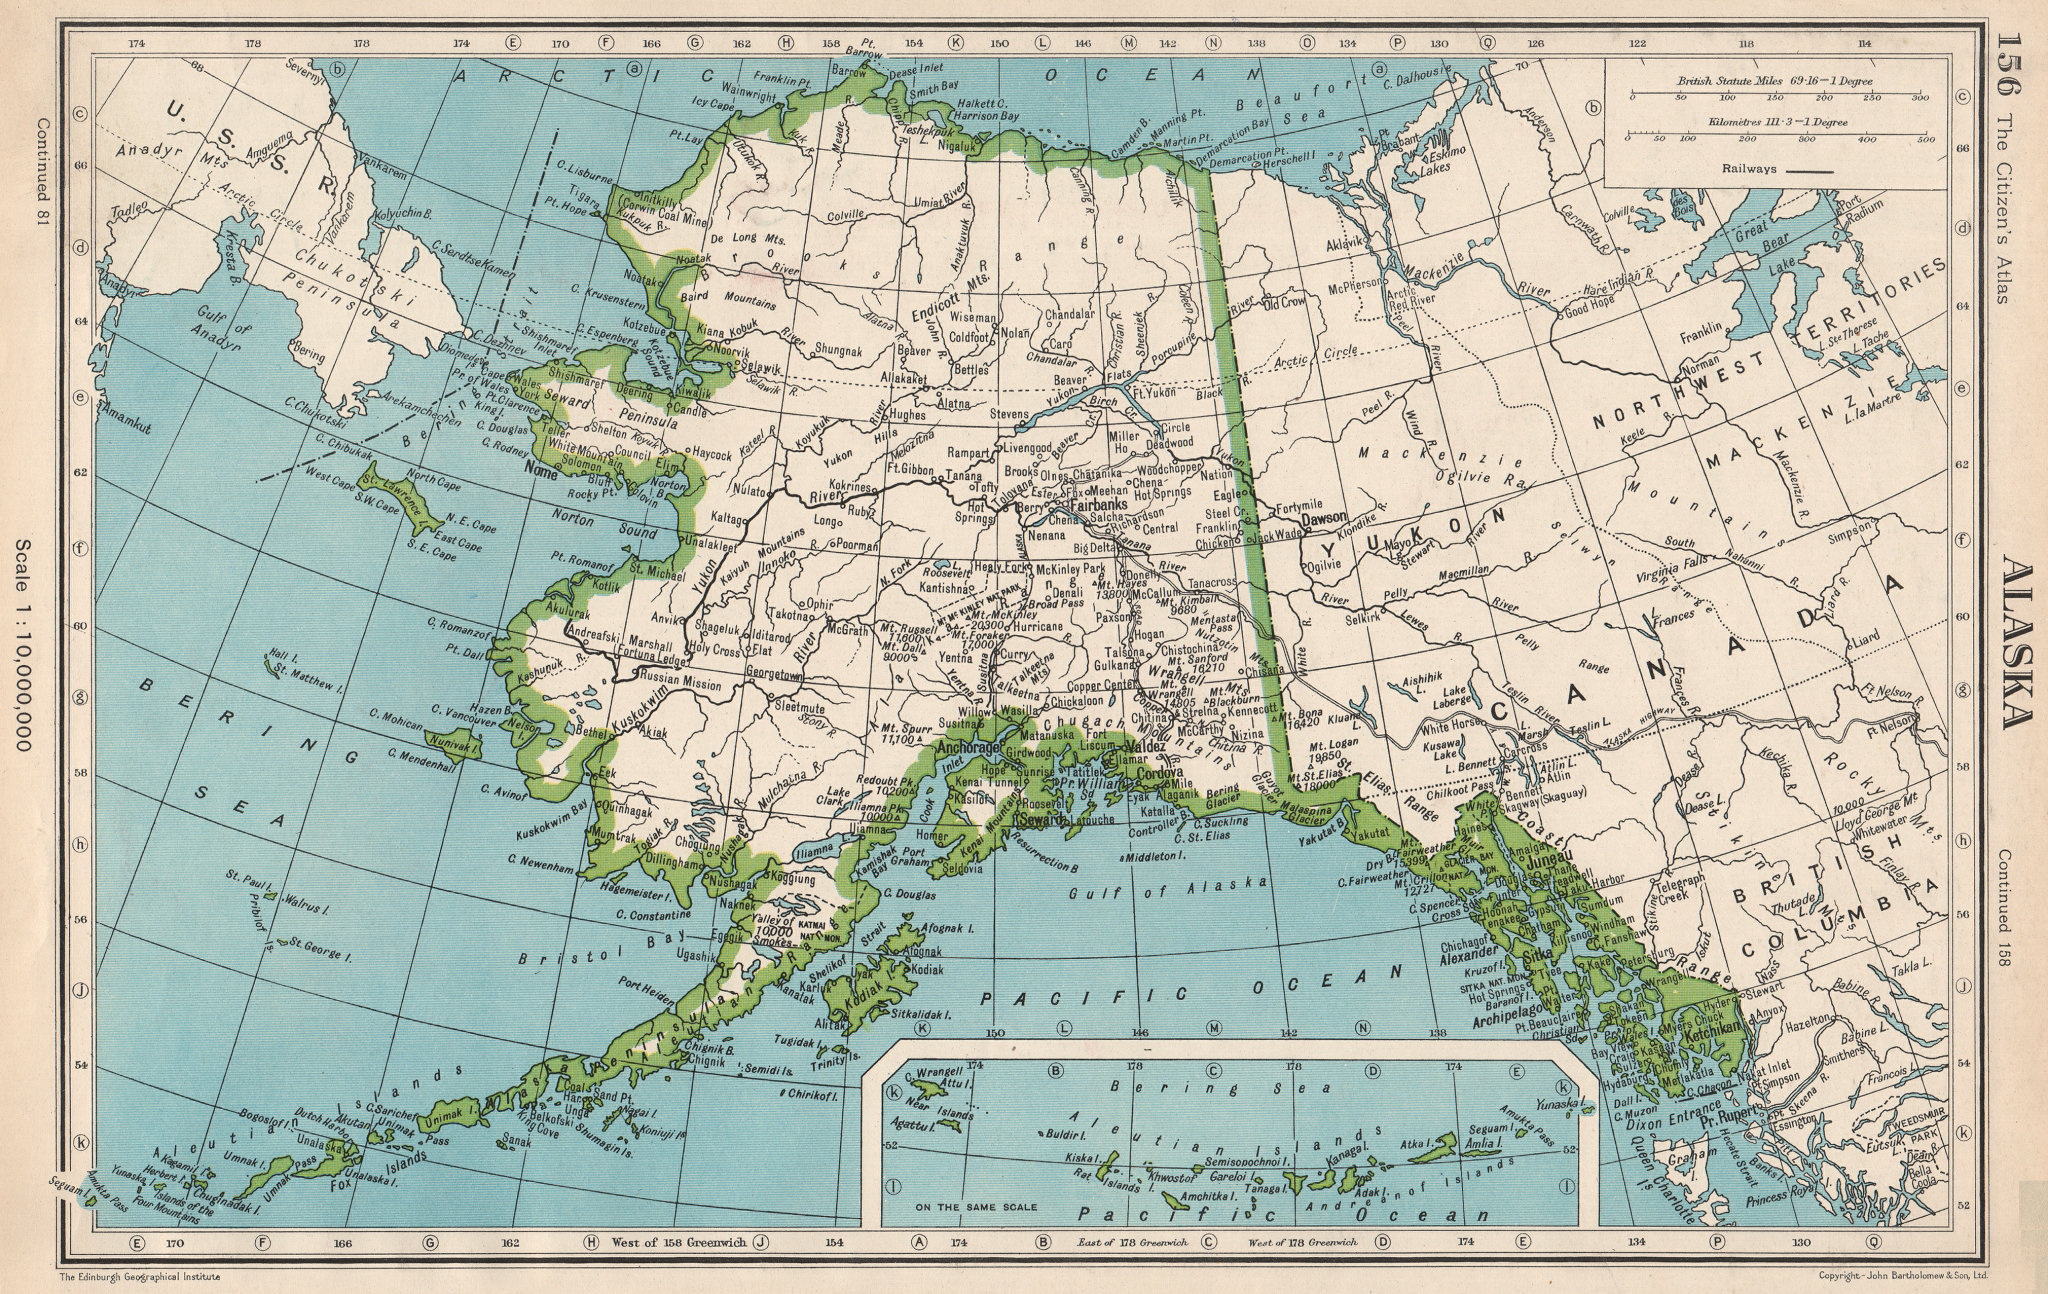 Associate Product ALASKA. railways. Mountains. BARTHOLOMEW 1952 old vintage map plan chart